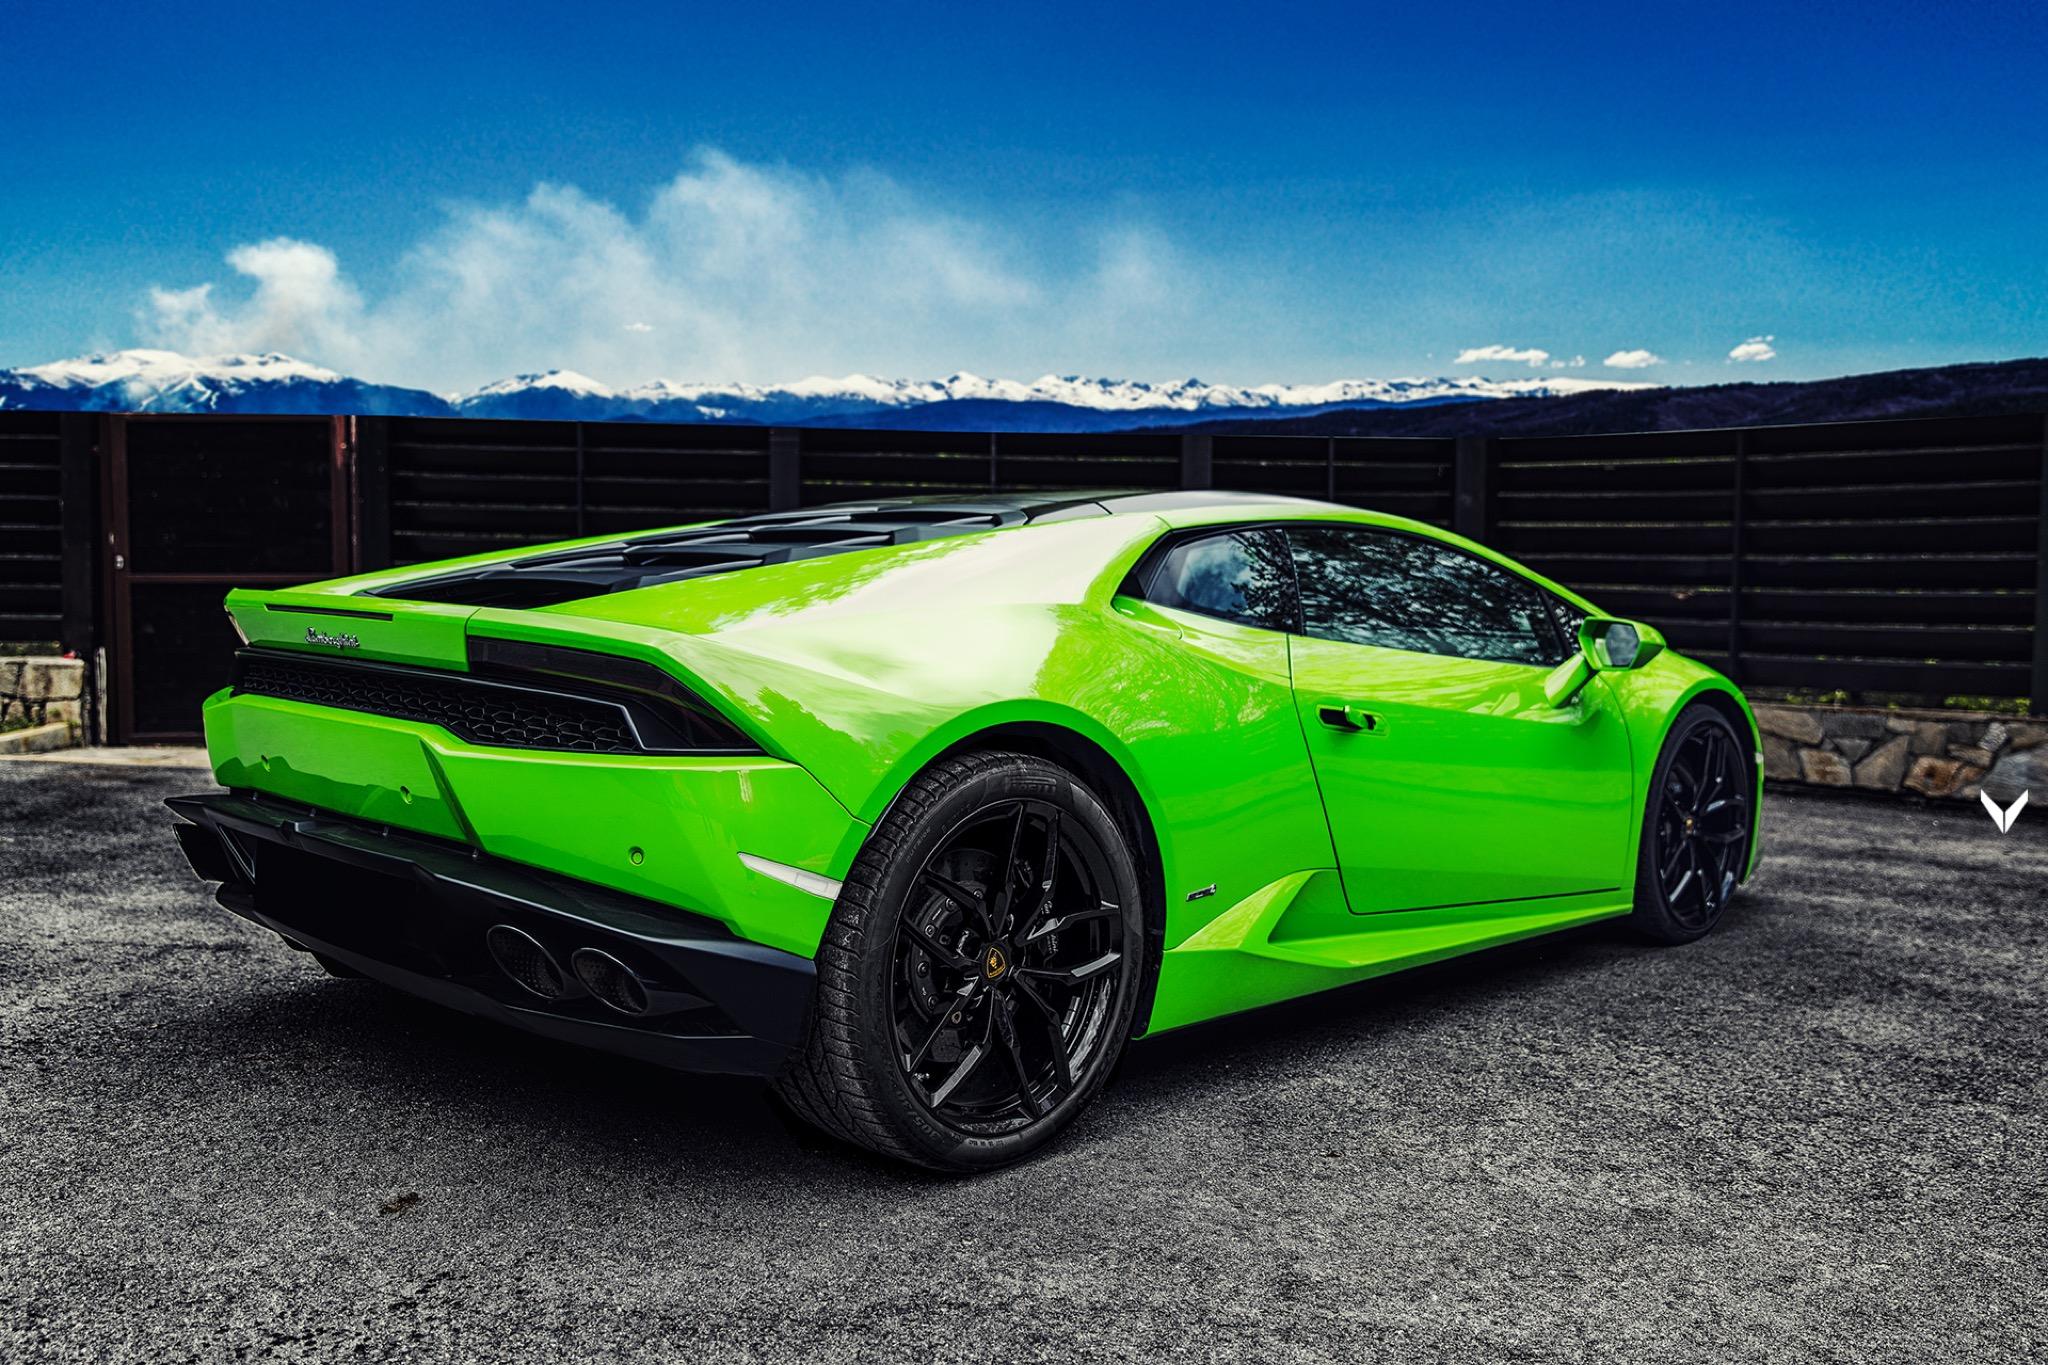 Car Black And Green Wallpaper Alles Auf Gr 252 N Lamborghini Hurac 225 N Von Vilner